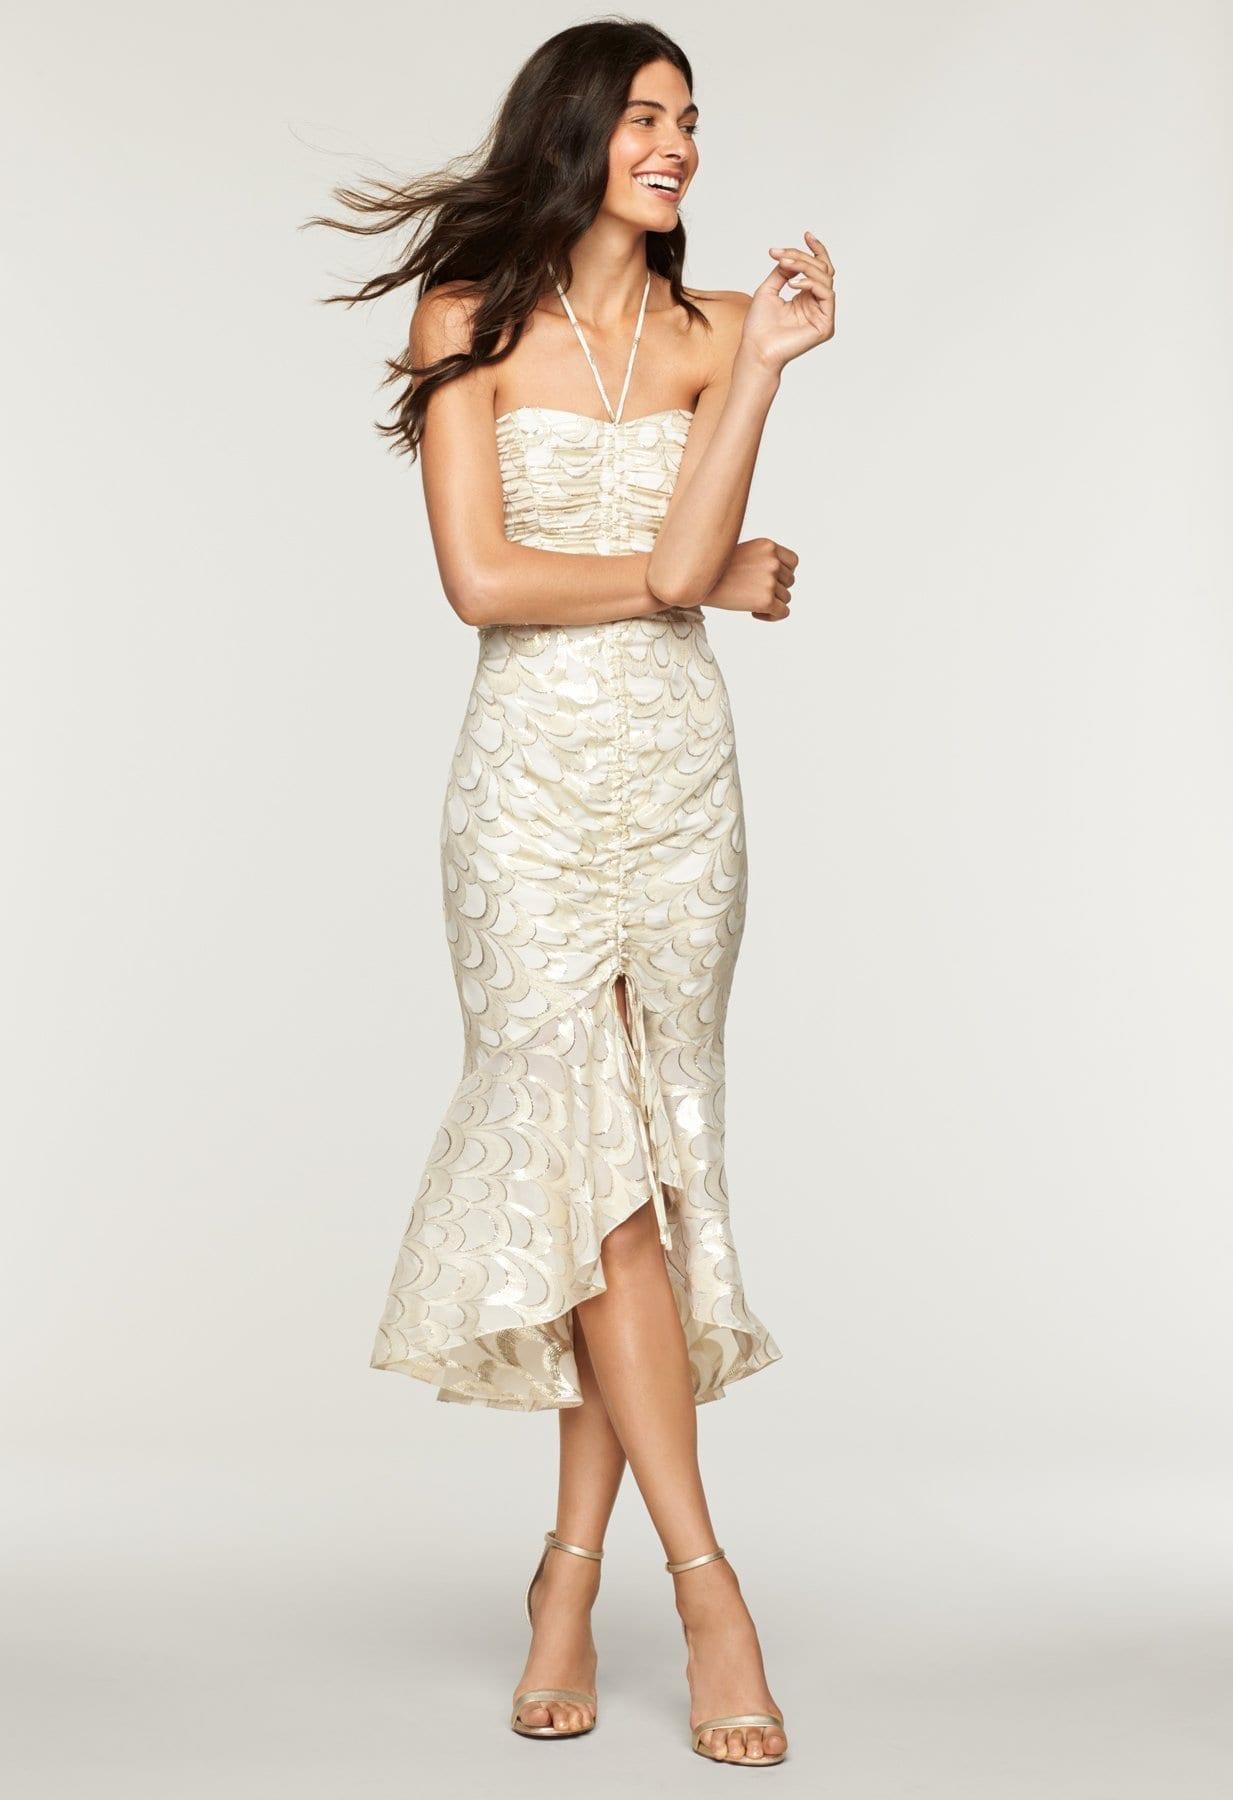 MILLY Silk Lurex Chiffon Tara Ecru Dress